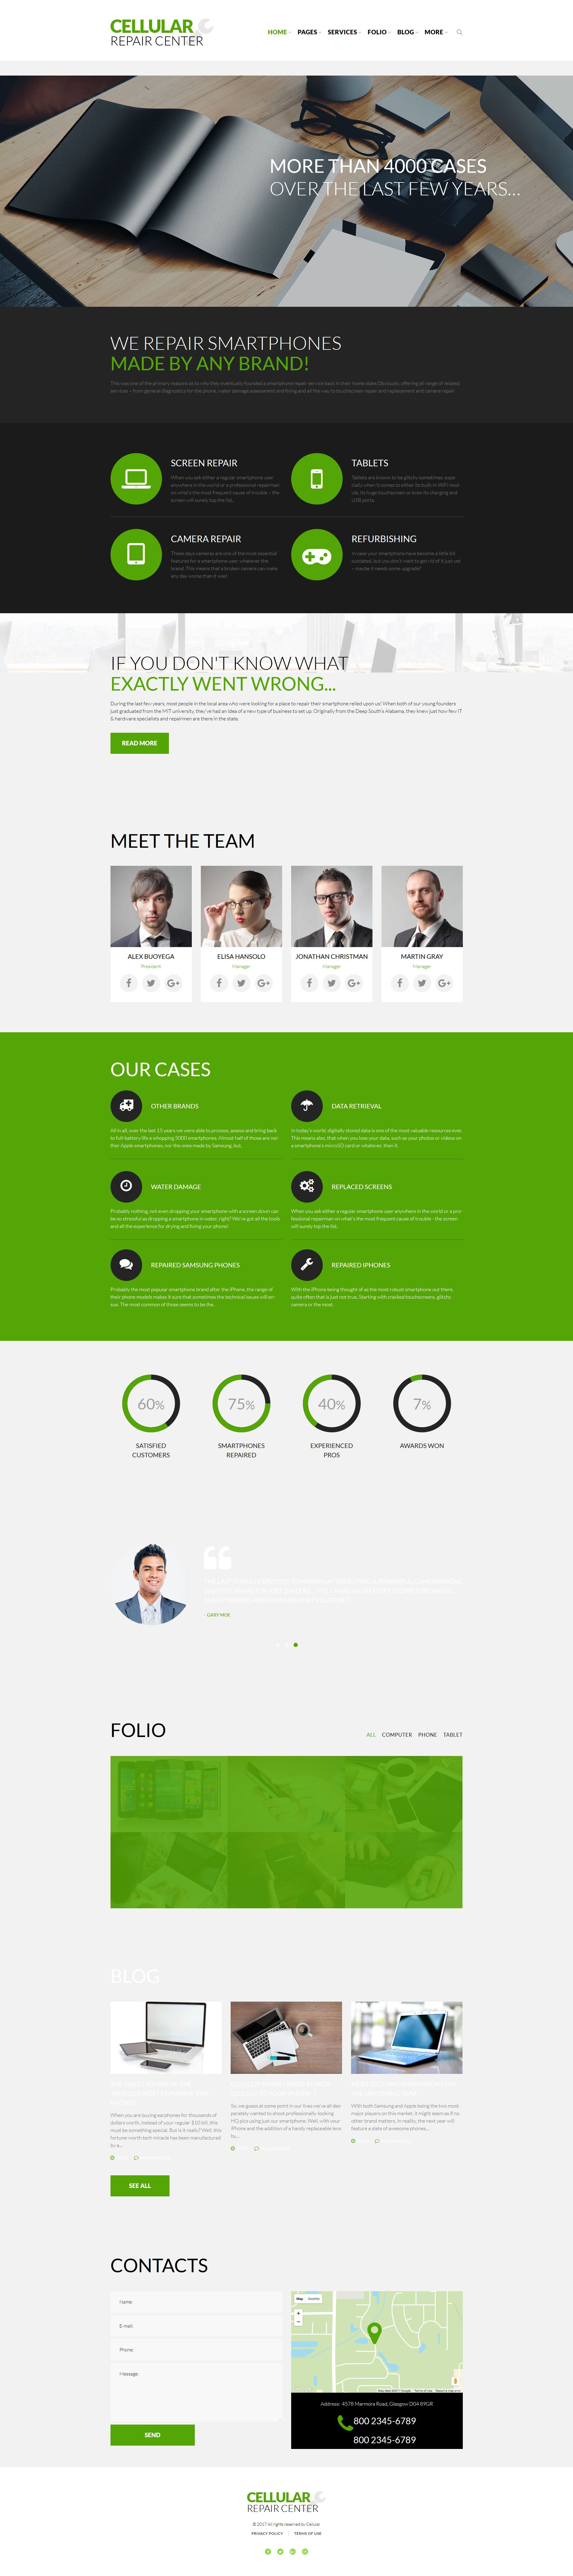 """Cellular Repair Center"" - адаптивний WordPress шаблон №51840 - скріншот"